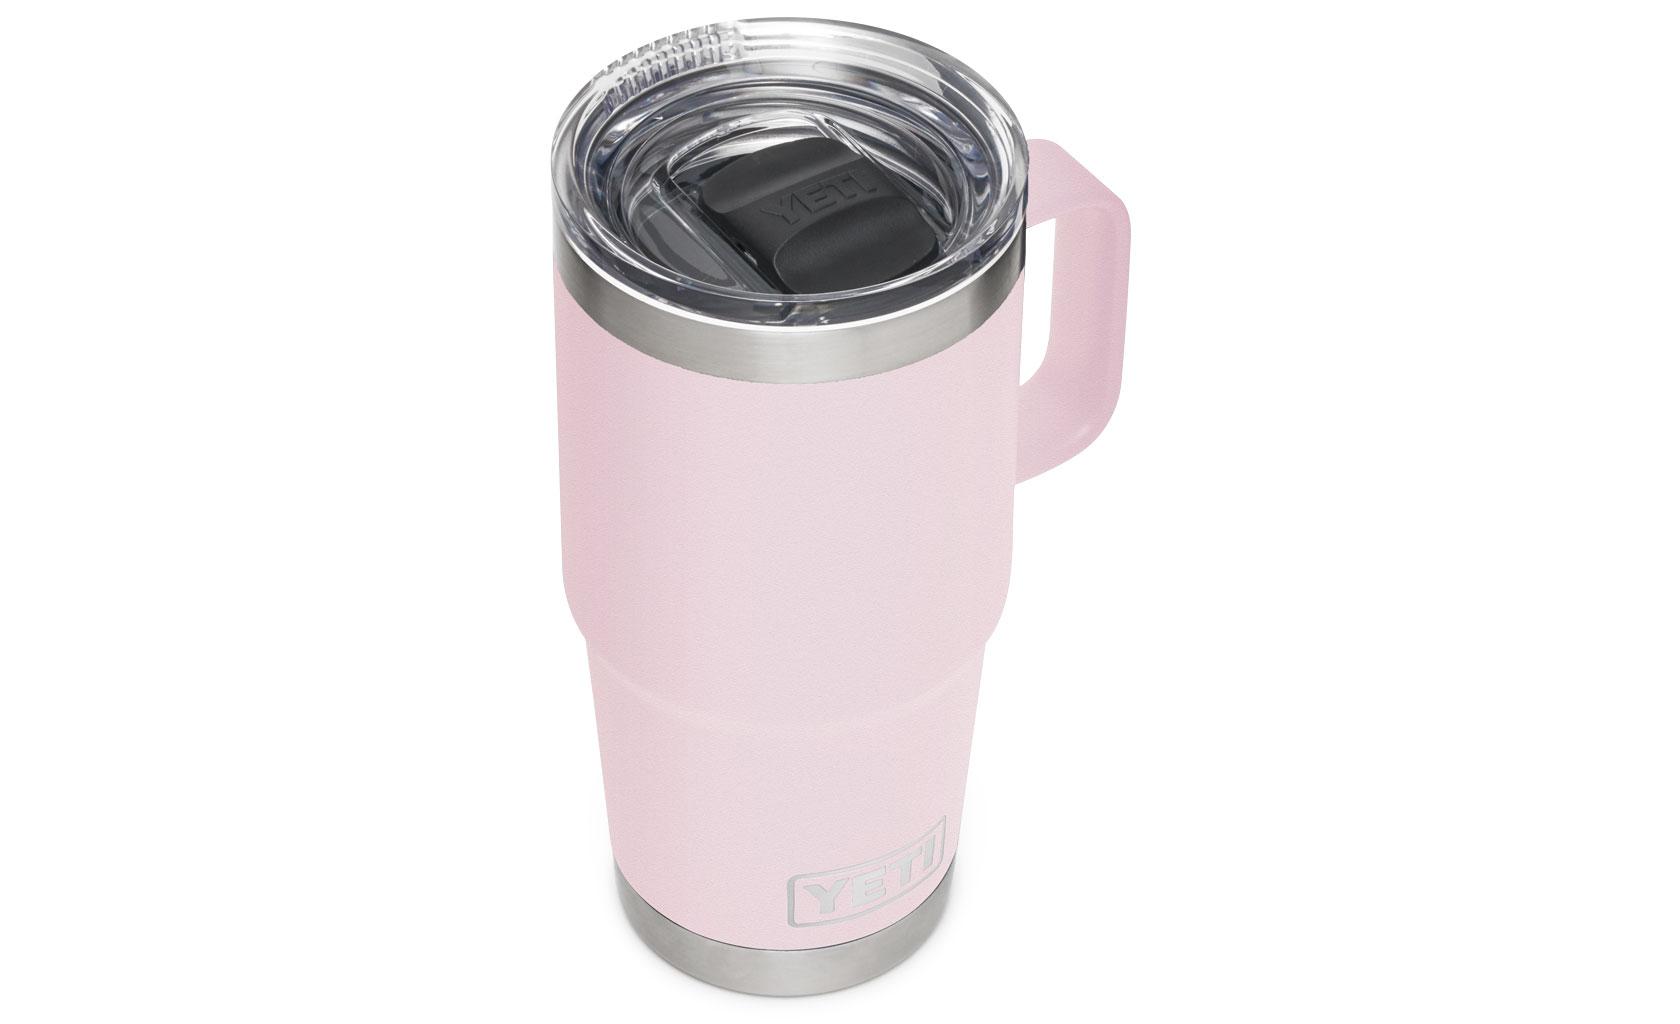 Yeti Rambler 20 Oz Travel Mug With Stronghold Lid Ice Pink